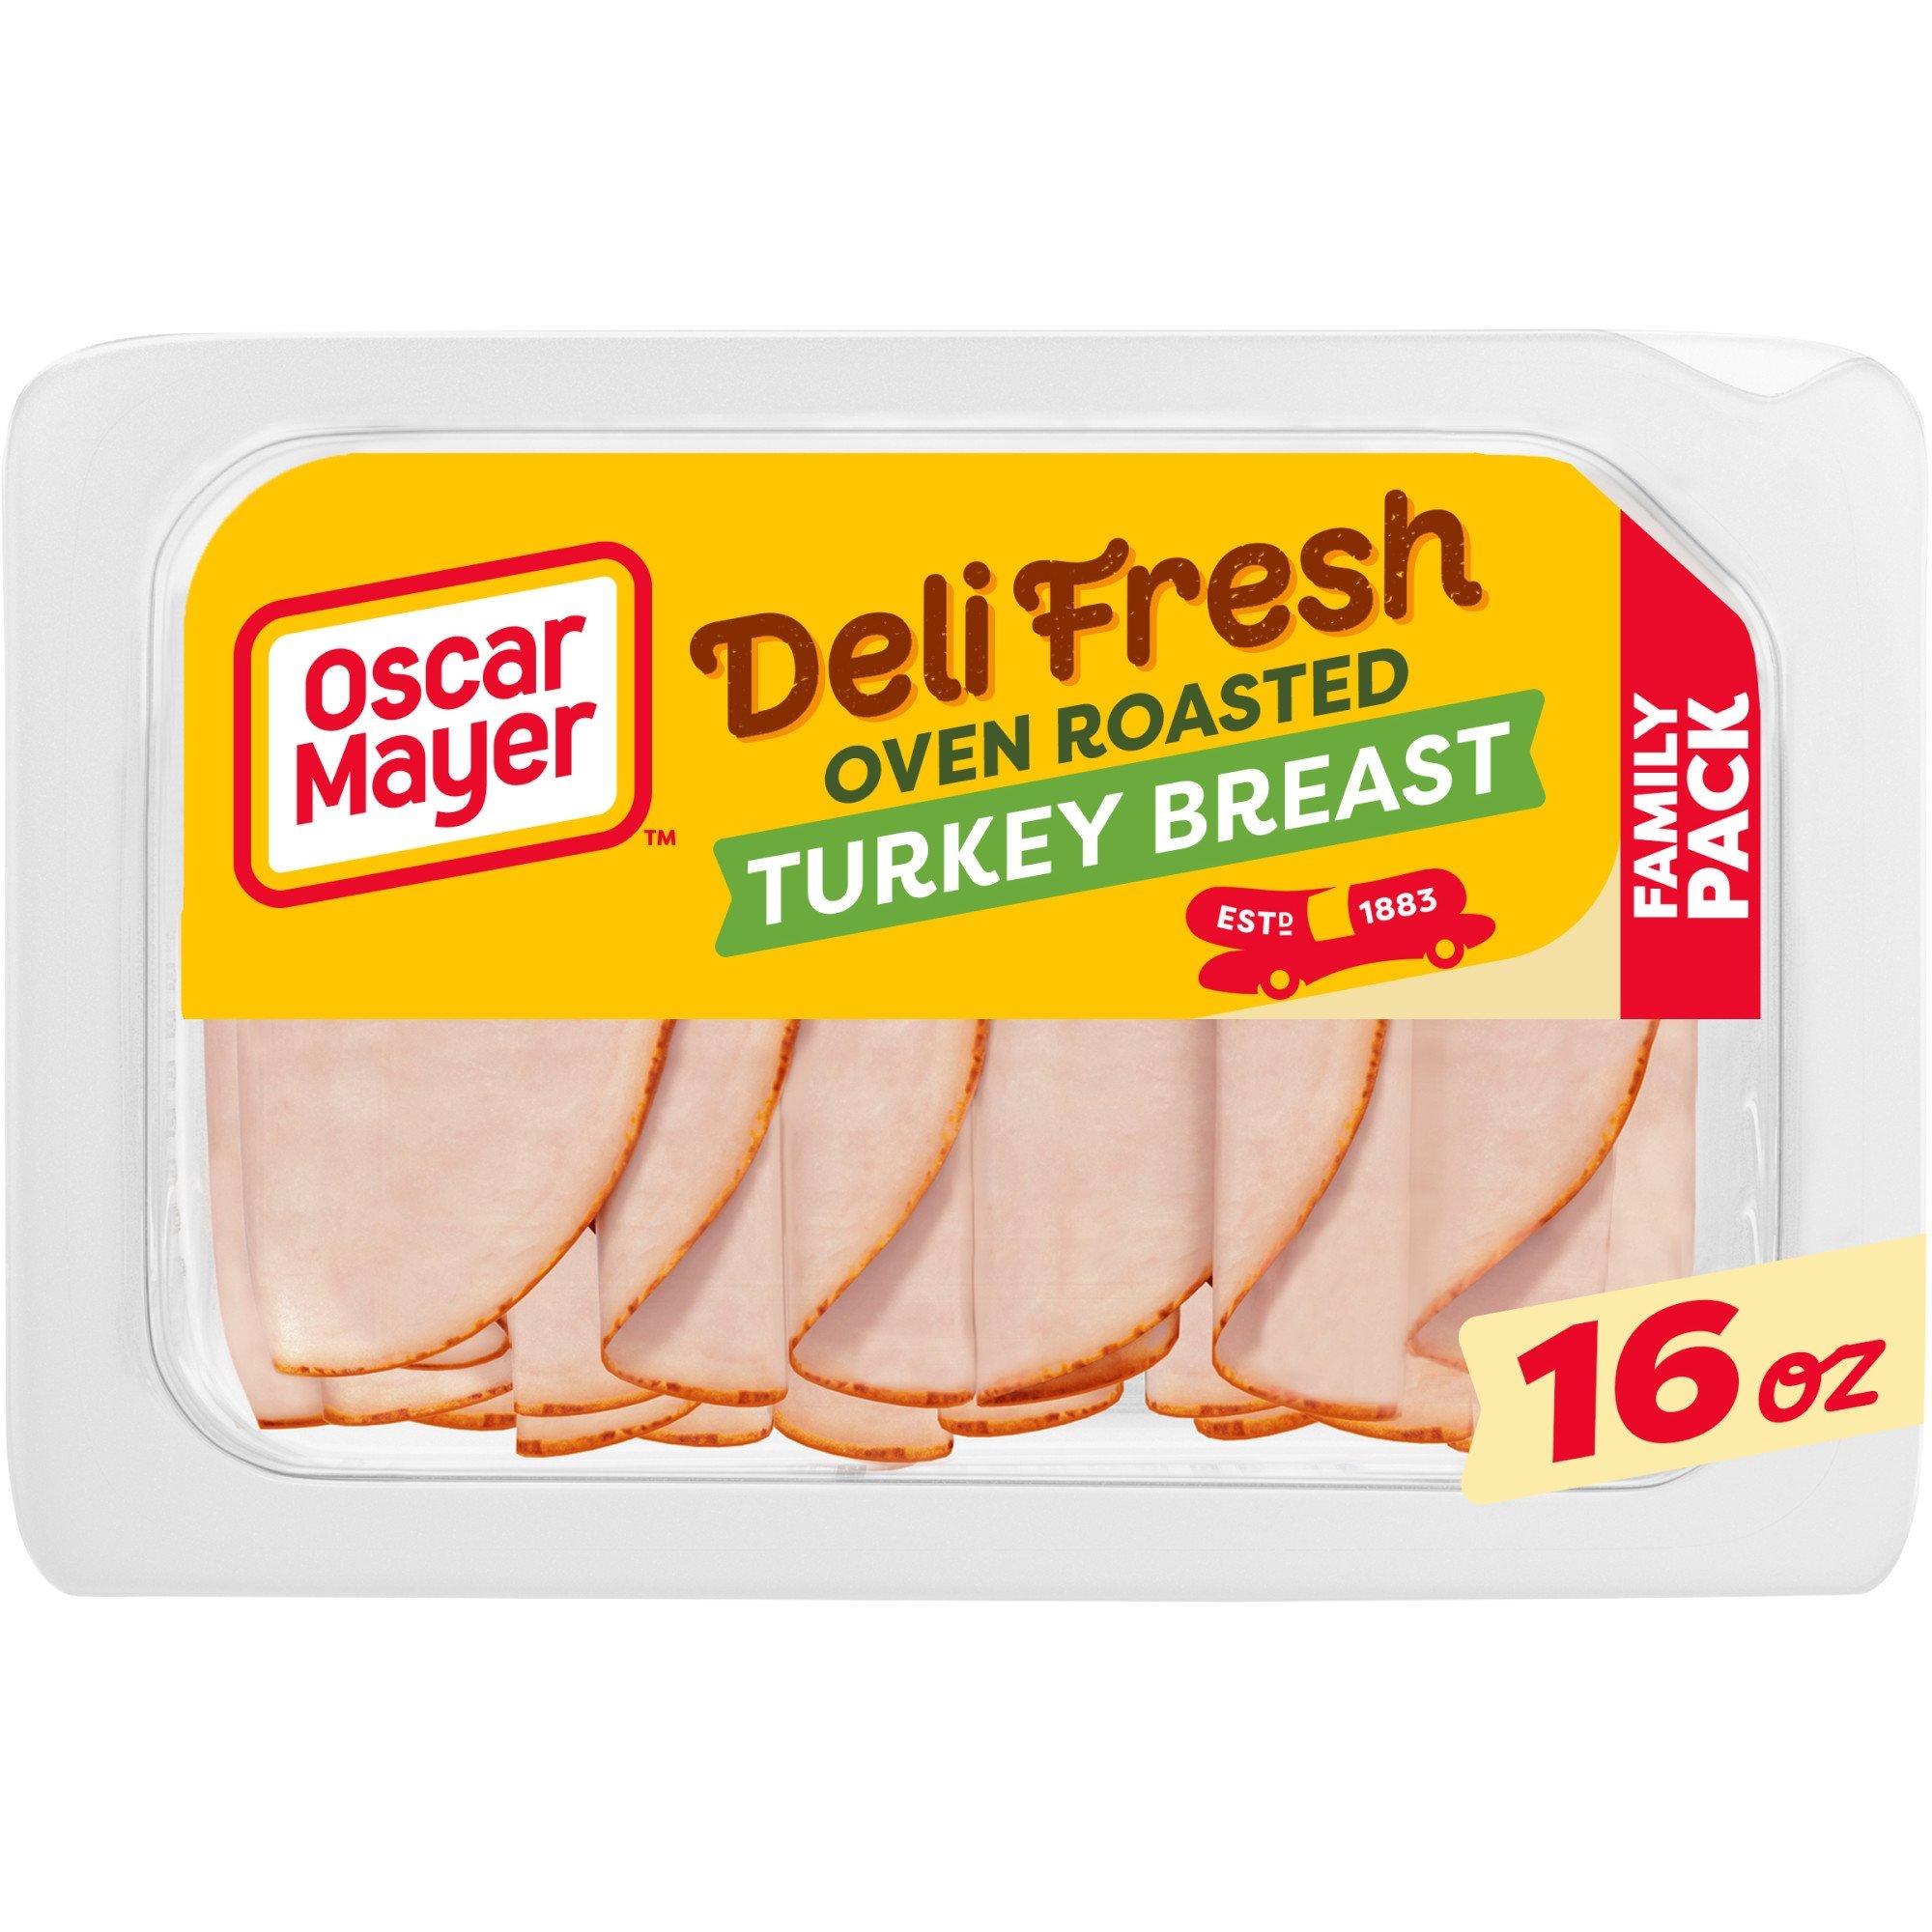 Oscar Mayer Oven Roasted Turkey Nutrition Facts likewise Deli Fresh Turkey Lunch Meat Nutrition Facts together with Oscar Mayer Lunch Meat Just 1 04 Kroger likewise A 12945876 also 10292750. on oscar mayer deli lunch meat